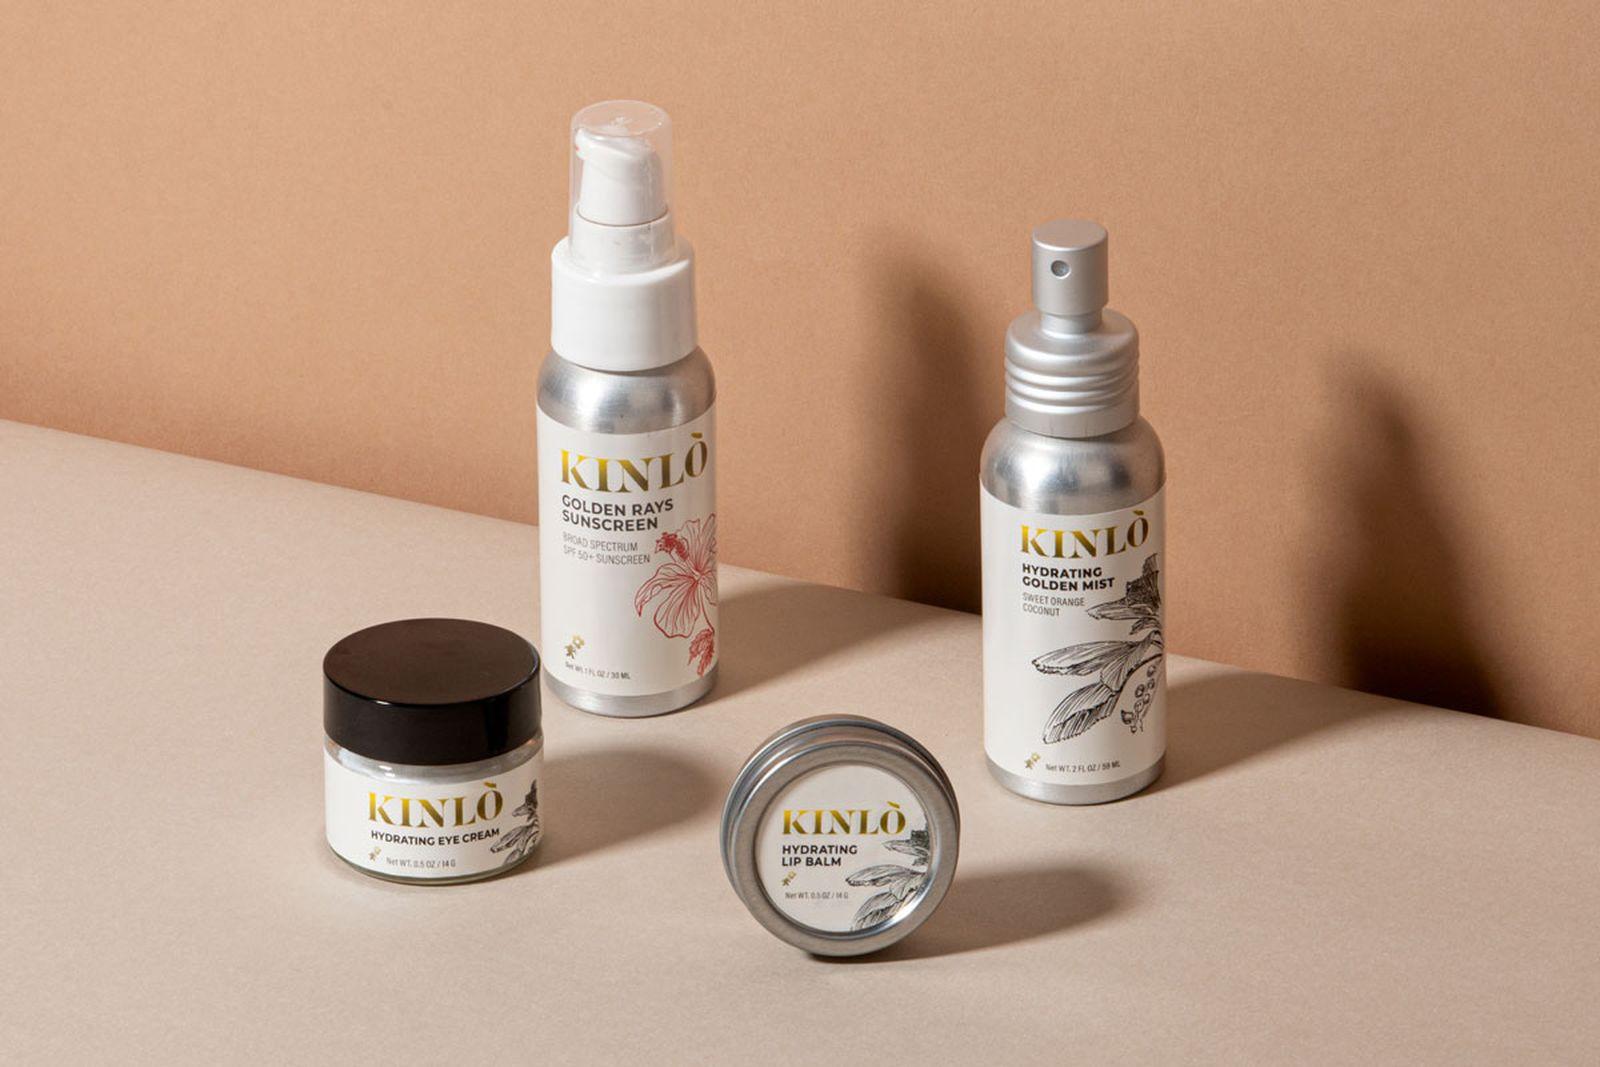 naomi-osaka-kinlo-skincare-release-02